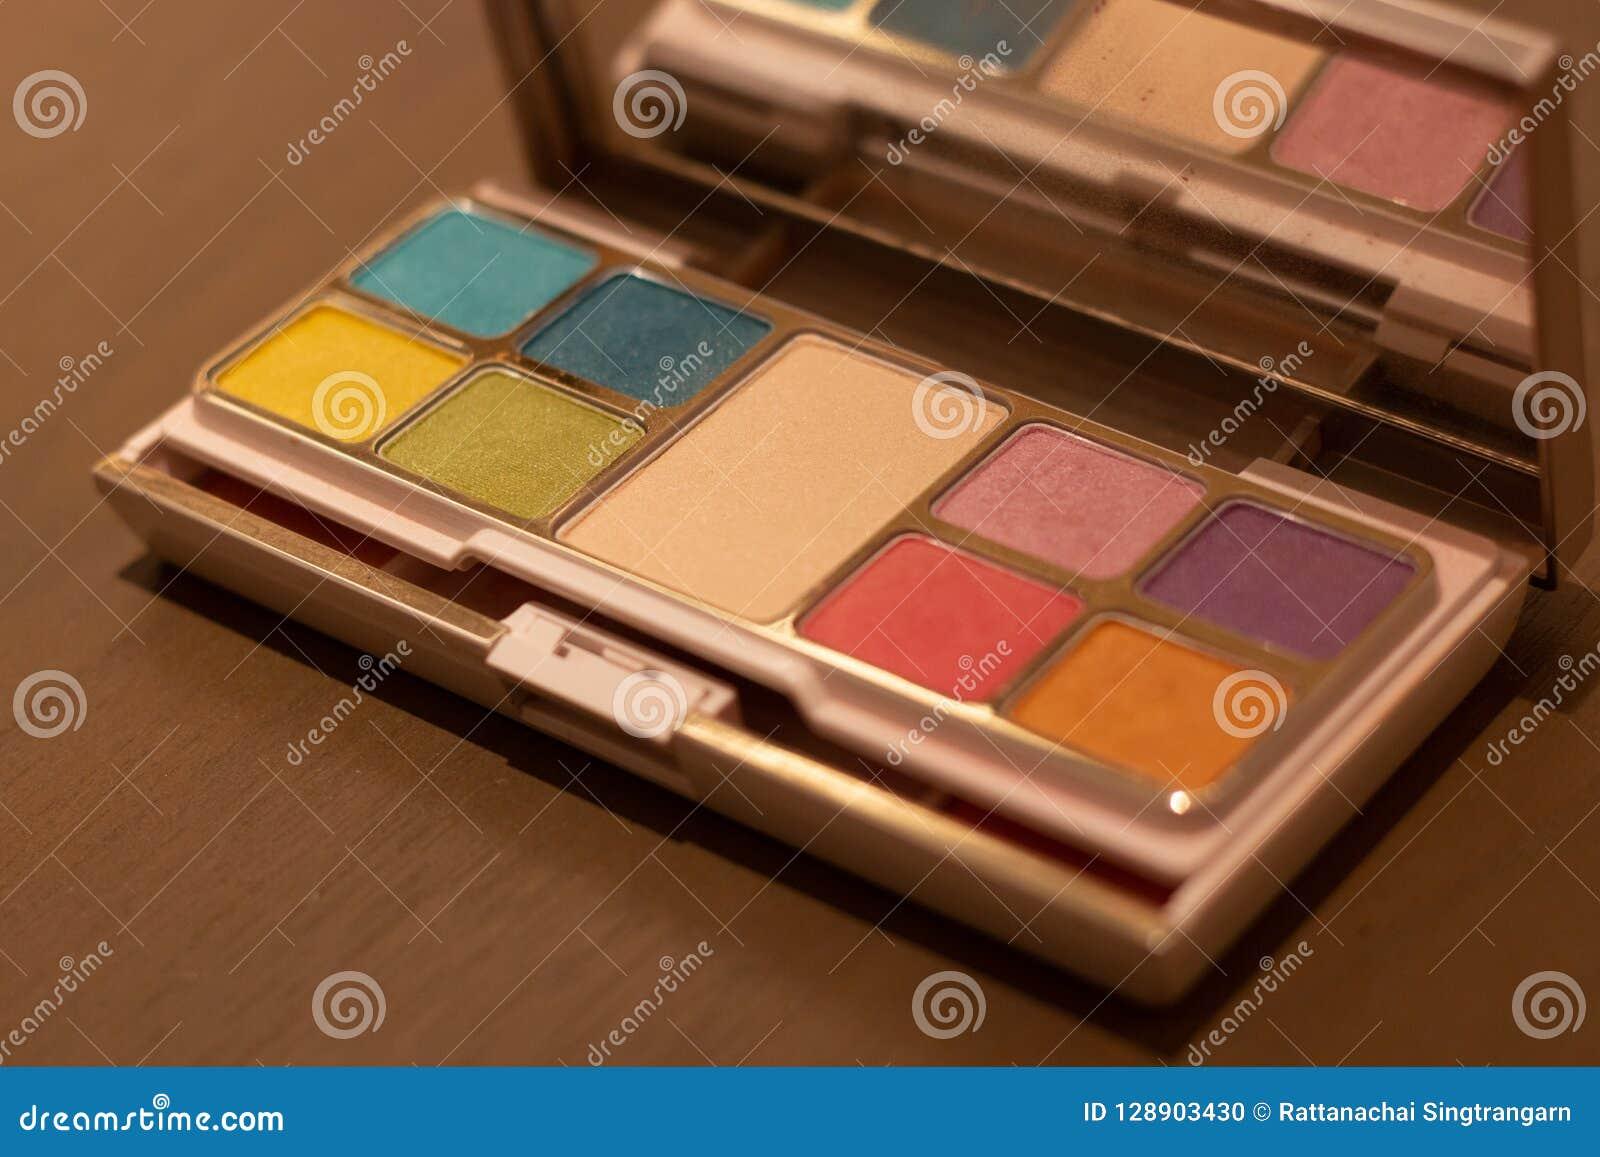 Den kosmetiska pulverasken st?llde in m?nga f?rg p? tr?tabellen